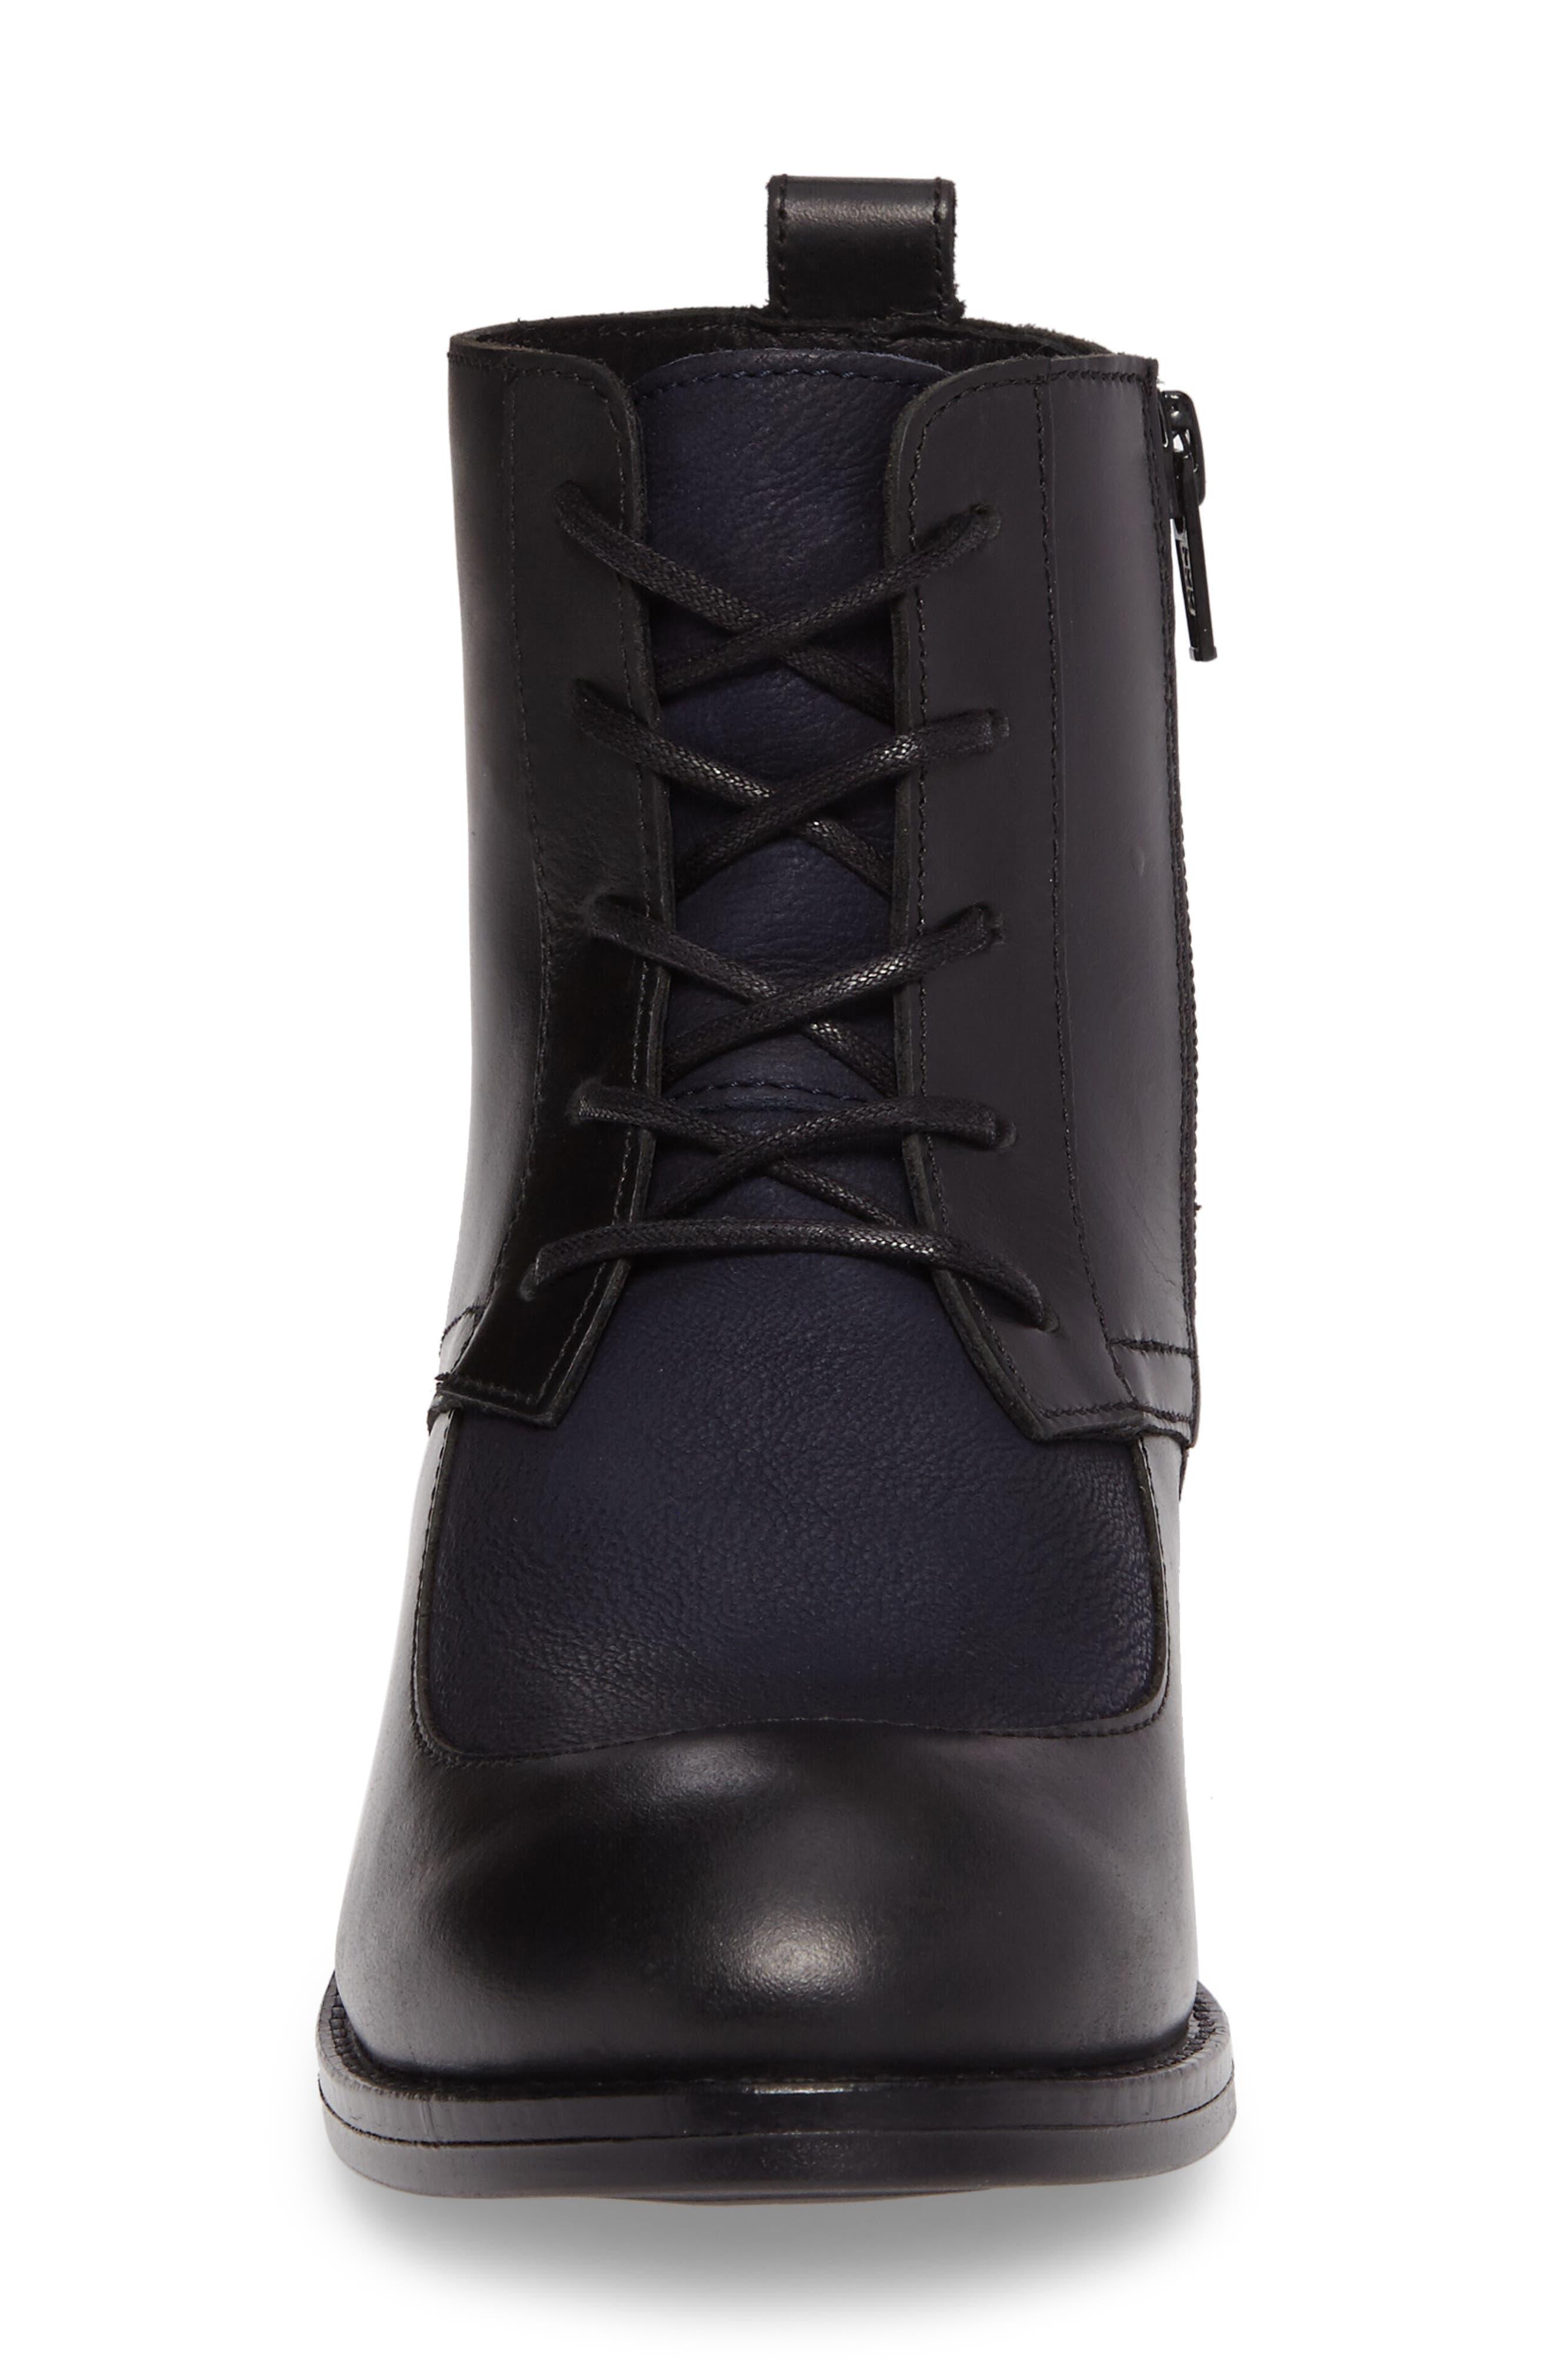 Arty Boot,                             Alternate thumbnail 4, color,                             Black/ Ocean Leather